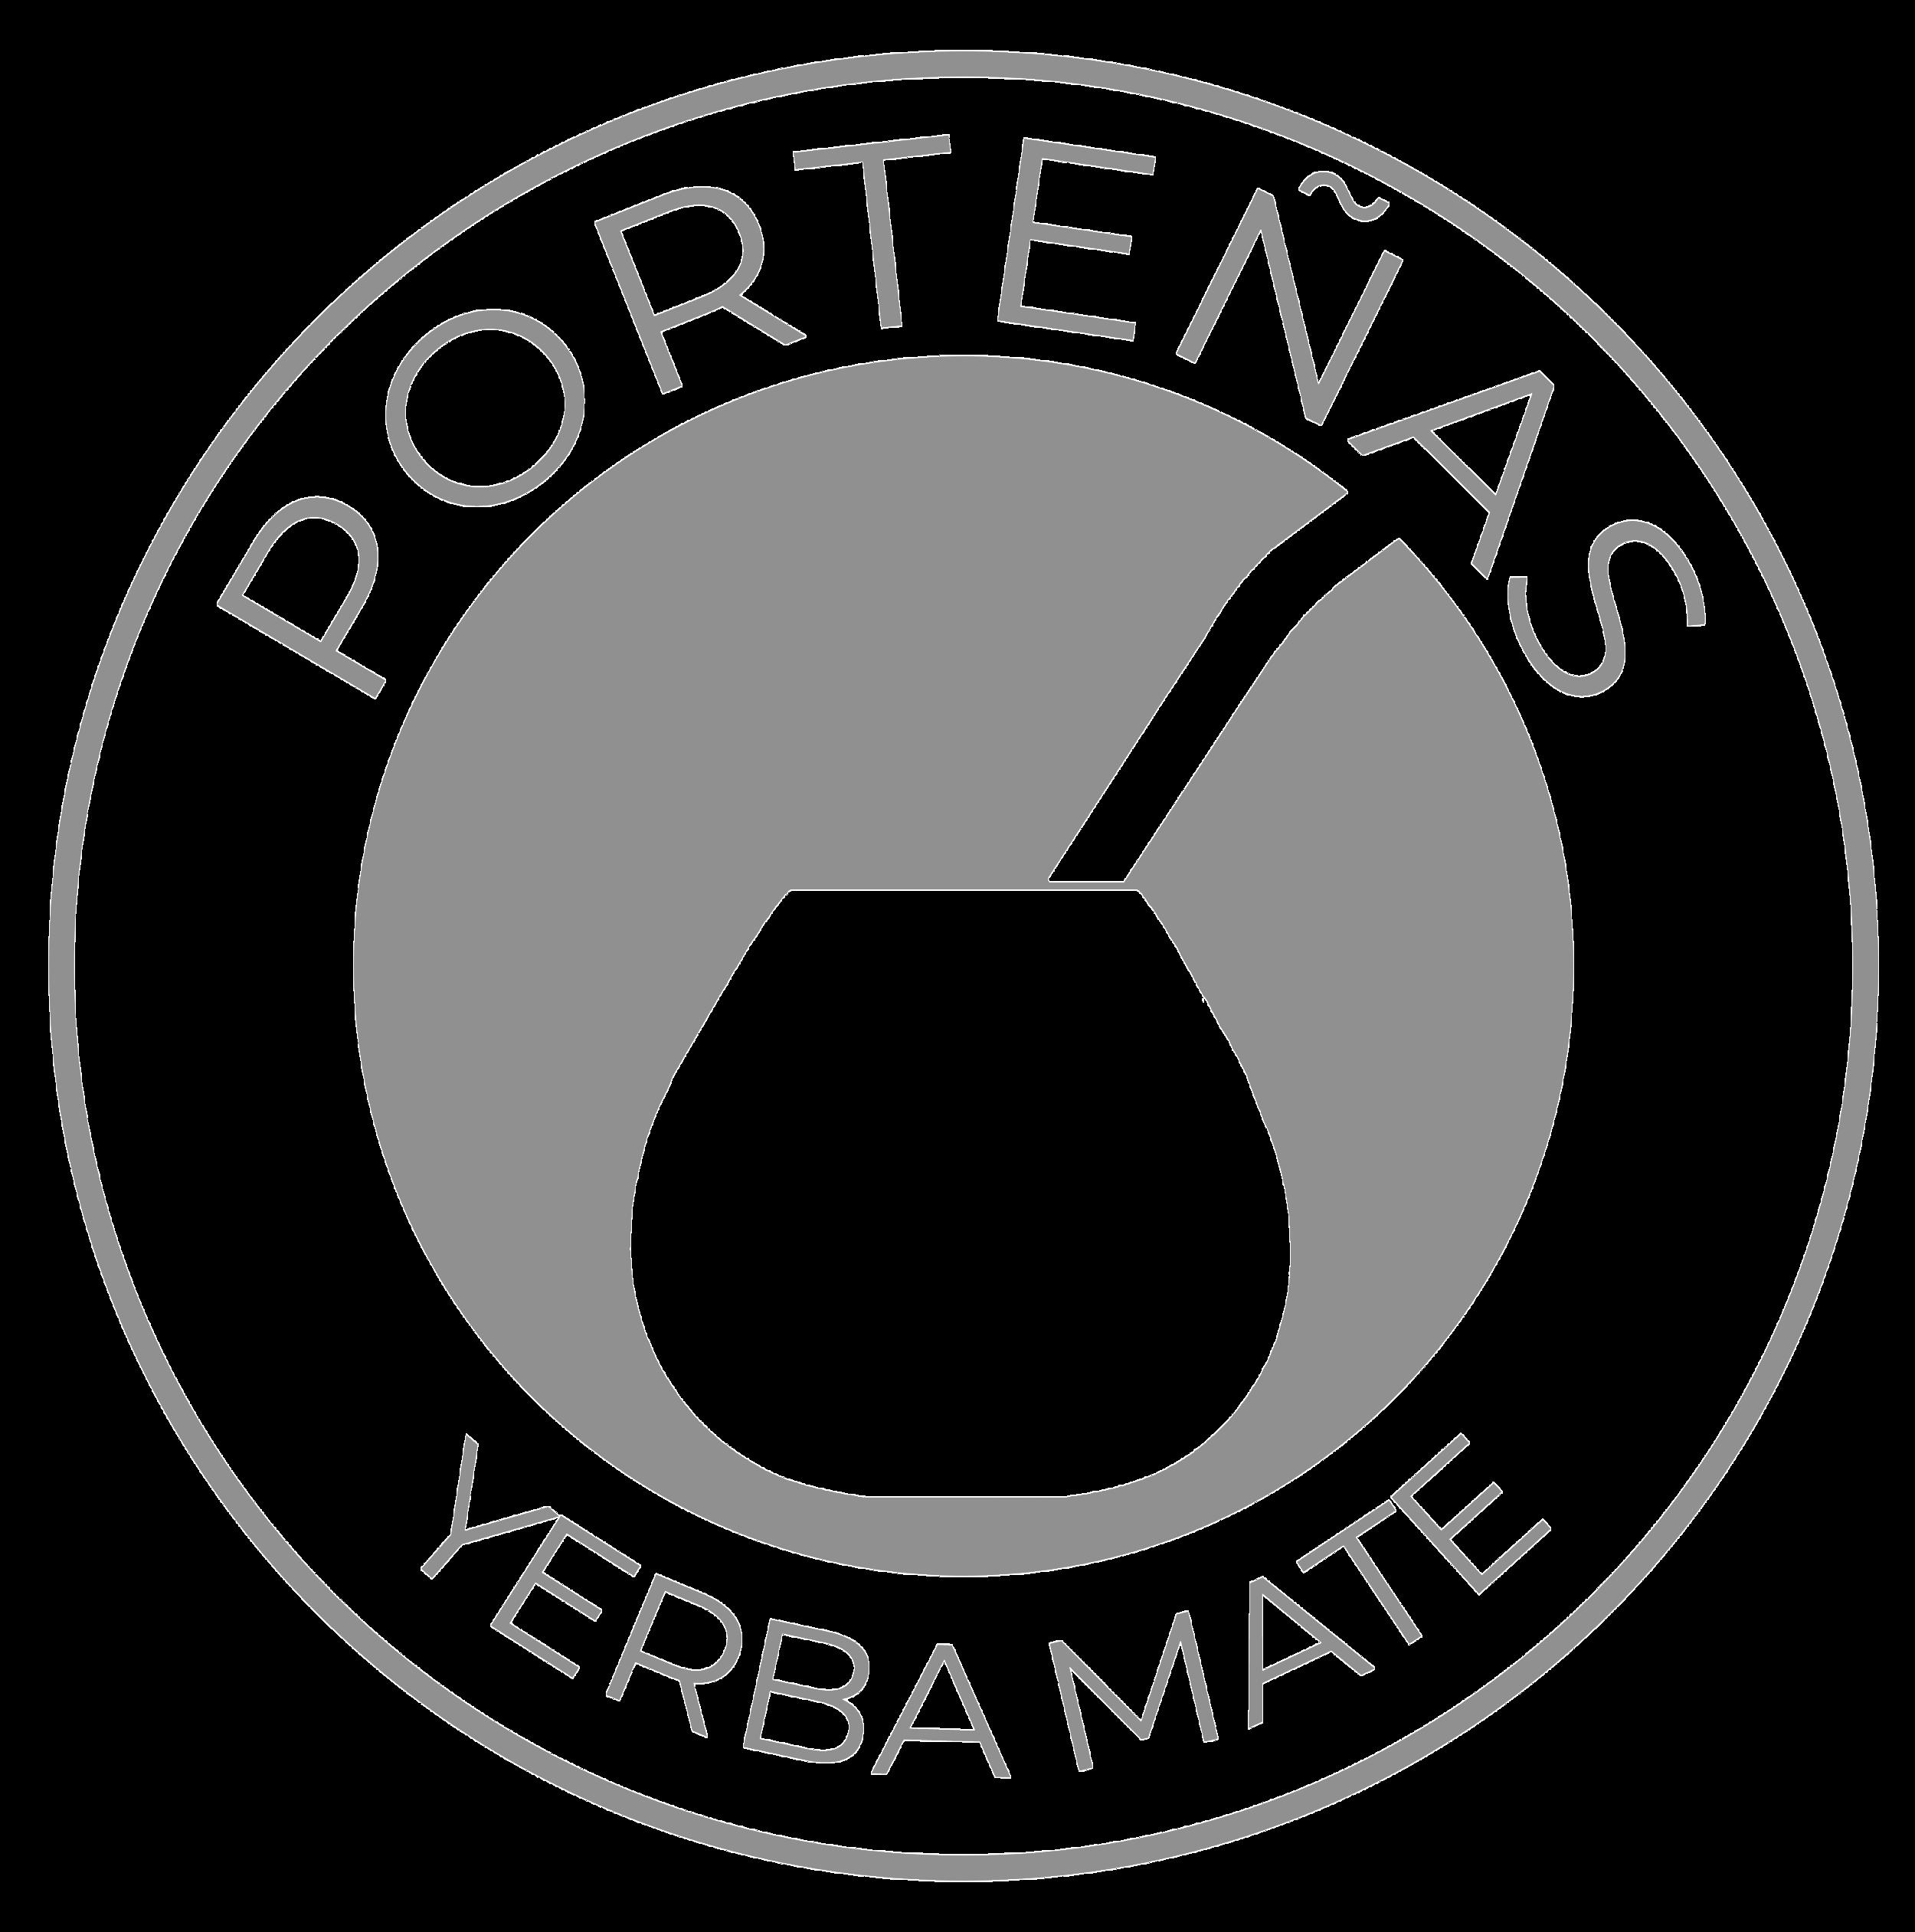 logo---circulo---yerba-mate.png